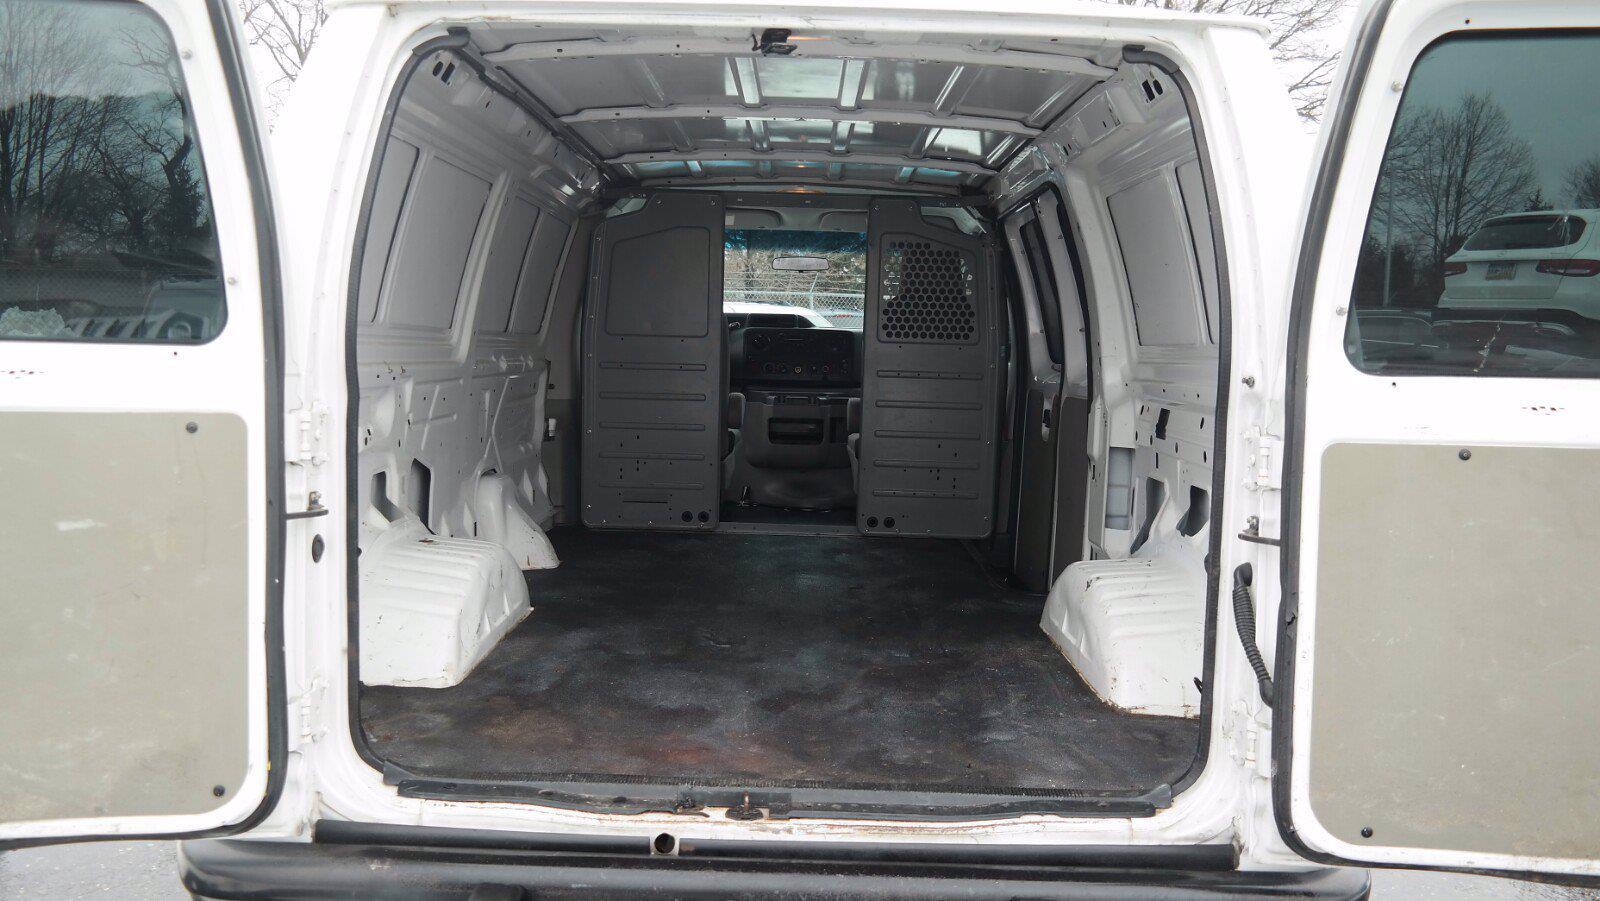 2012 Ford E-250 4x2, Empty Cargo Van #FL1056J - photo 1